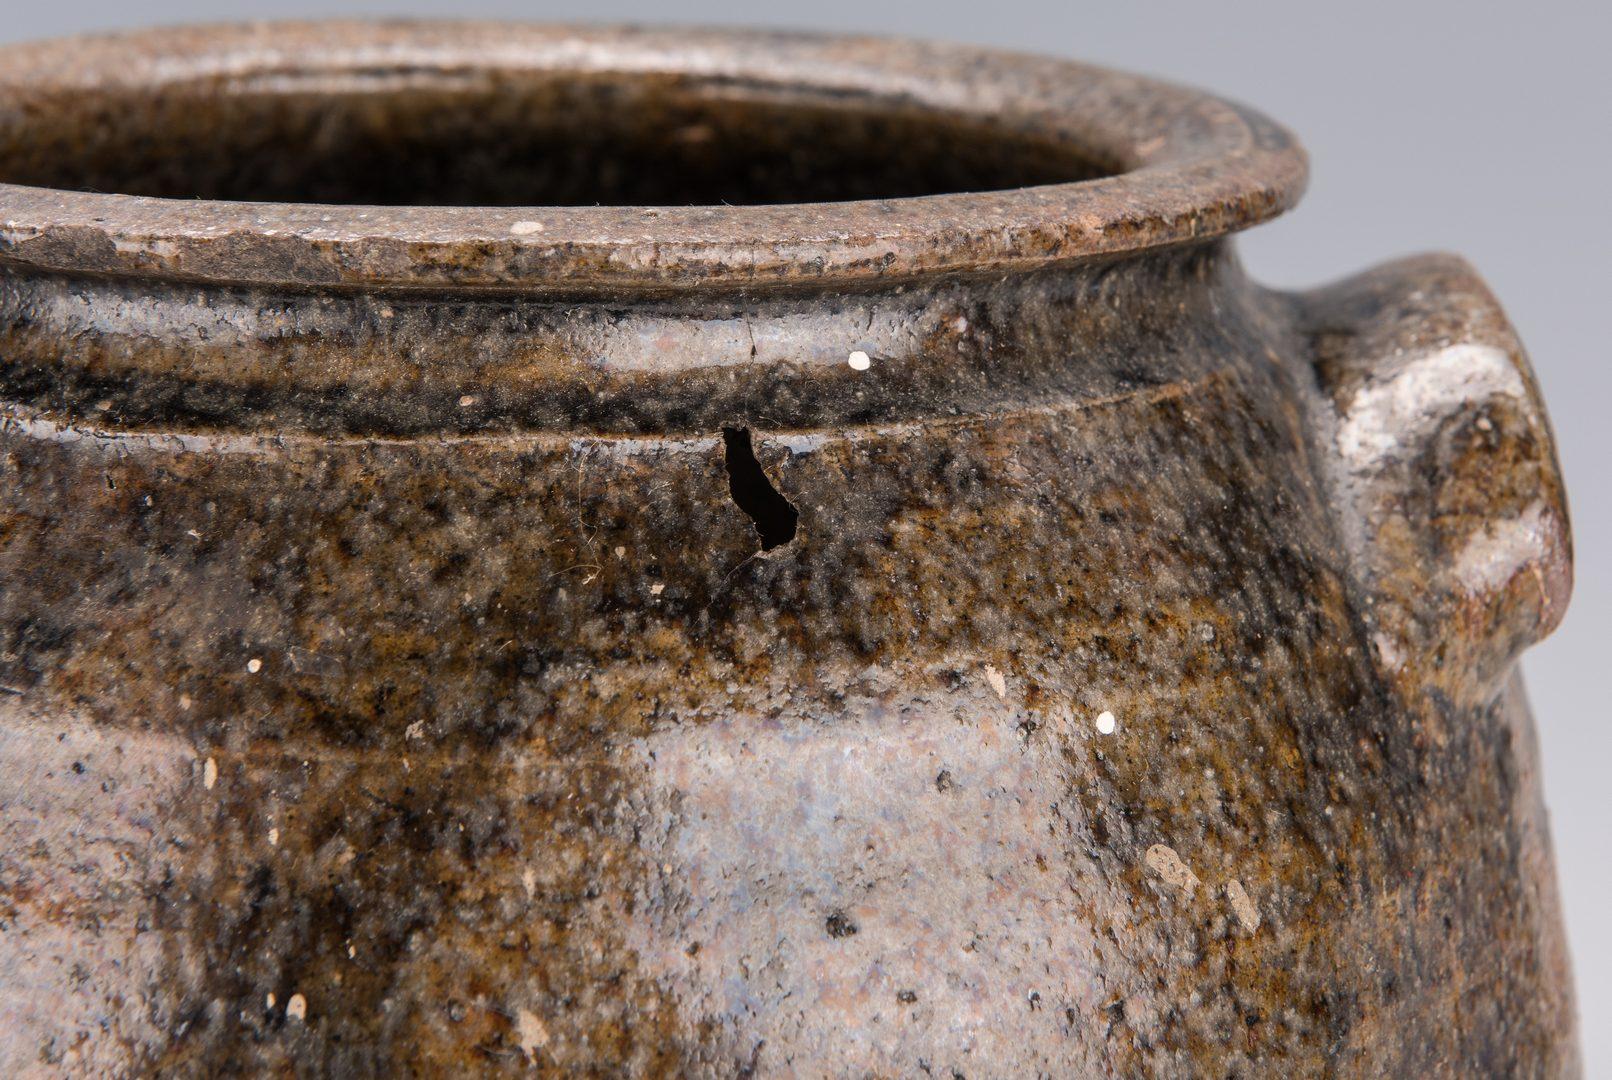 Lot 169: 2 Western NC Alkaline Glazed Pottery Jars